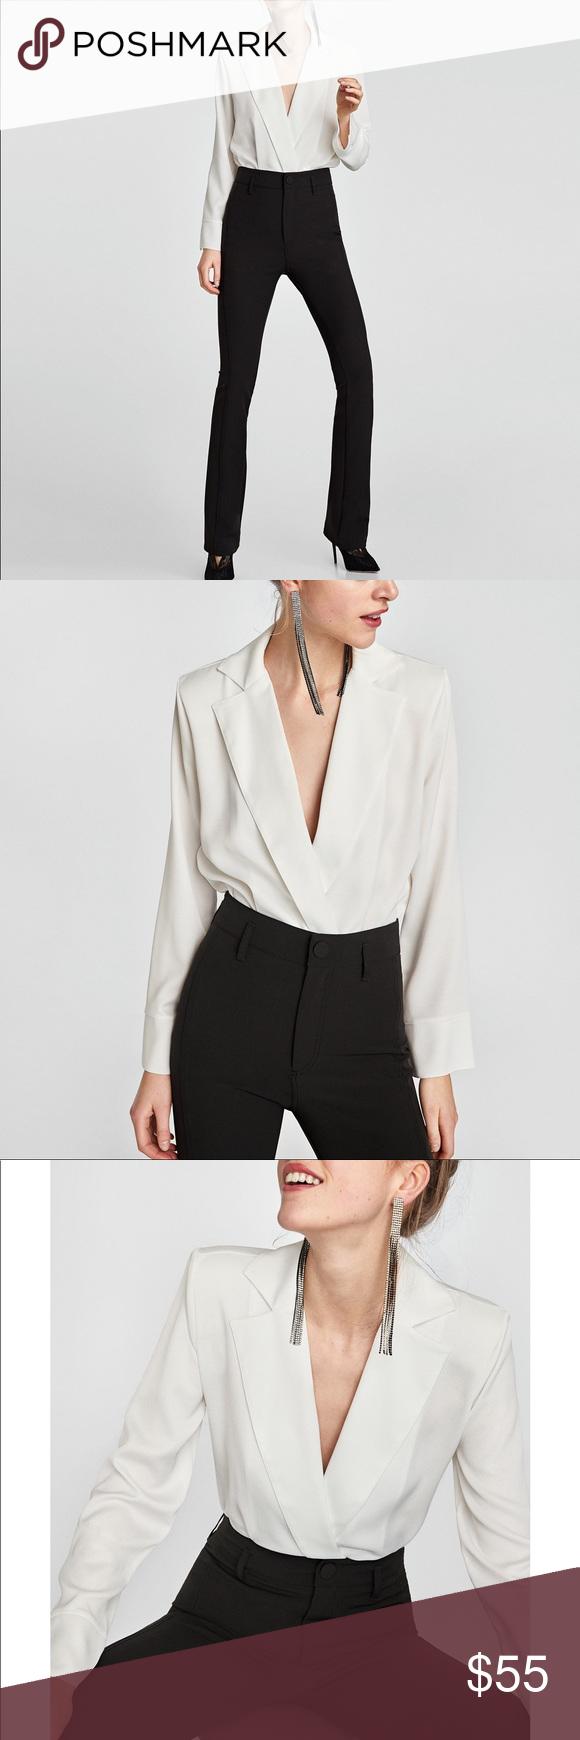 a139b496 NWT Zara White Bodysuit with Lapel Collar Bodysuit with crossover ...